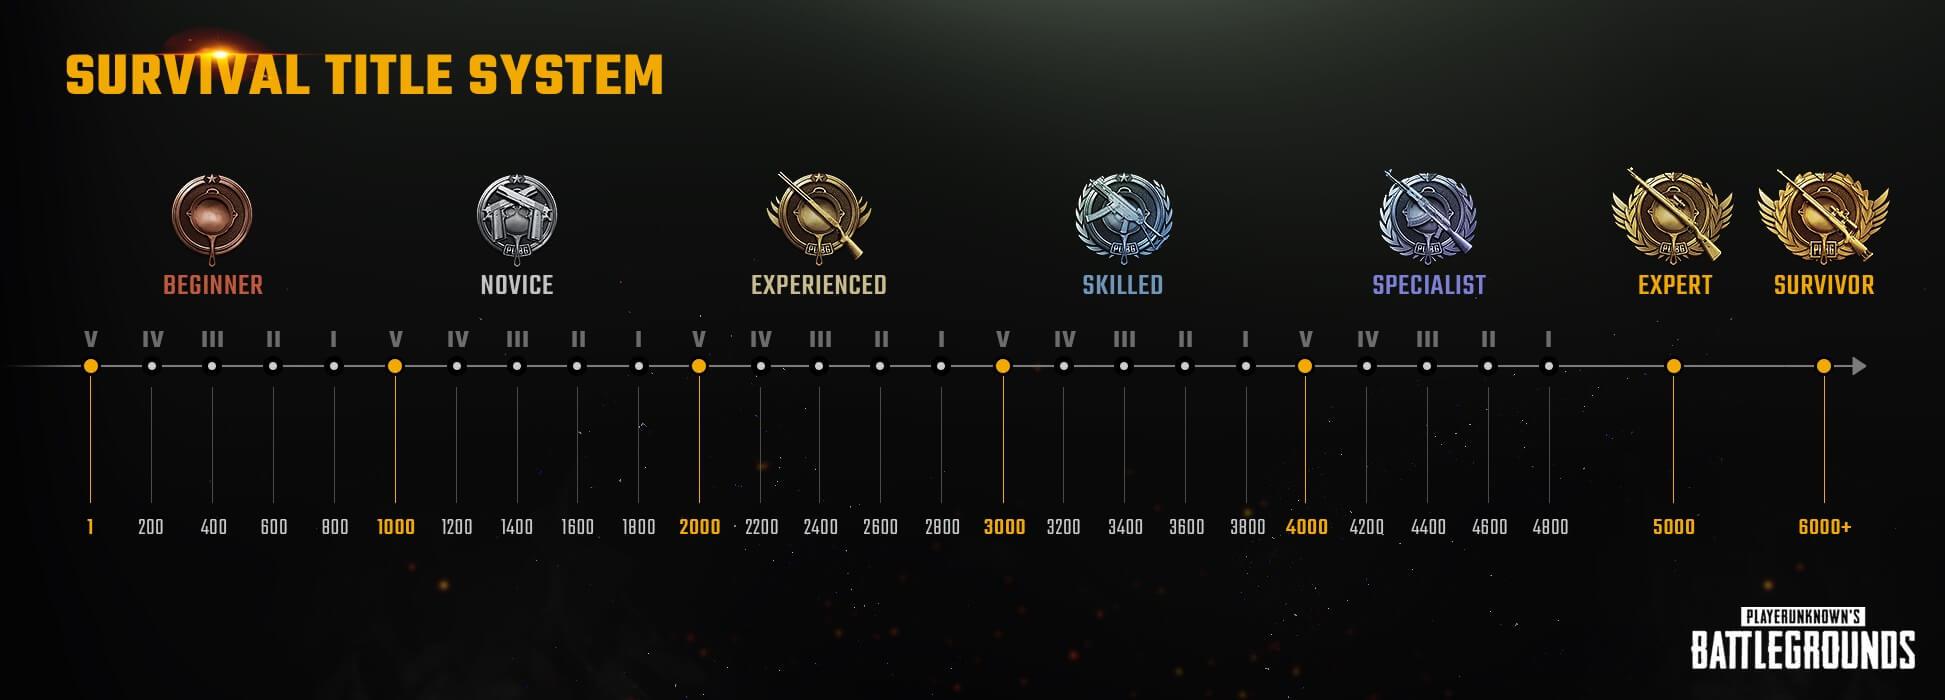 Survival Title System - PUBG Beta season 2